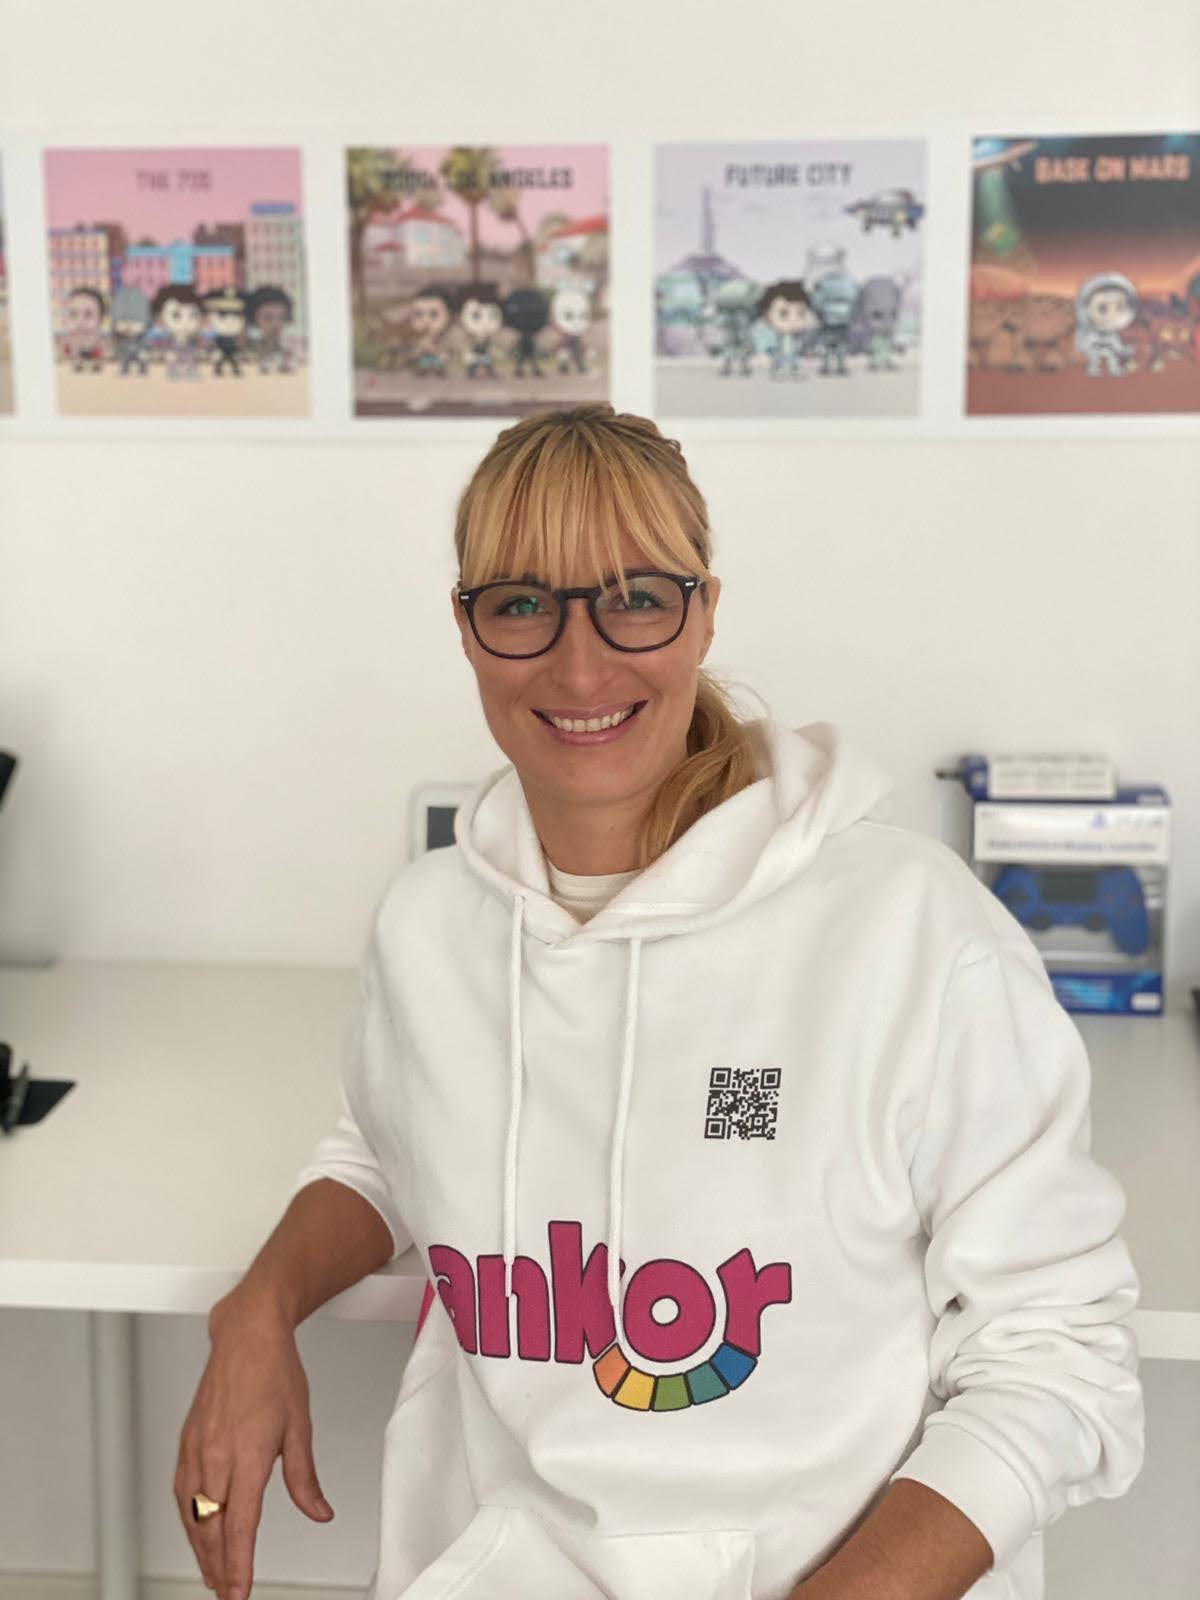 Silvia Turri Ankor Game